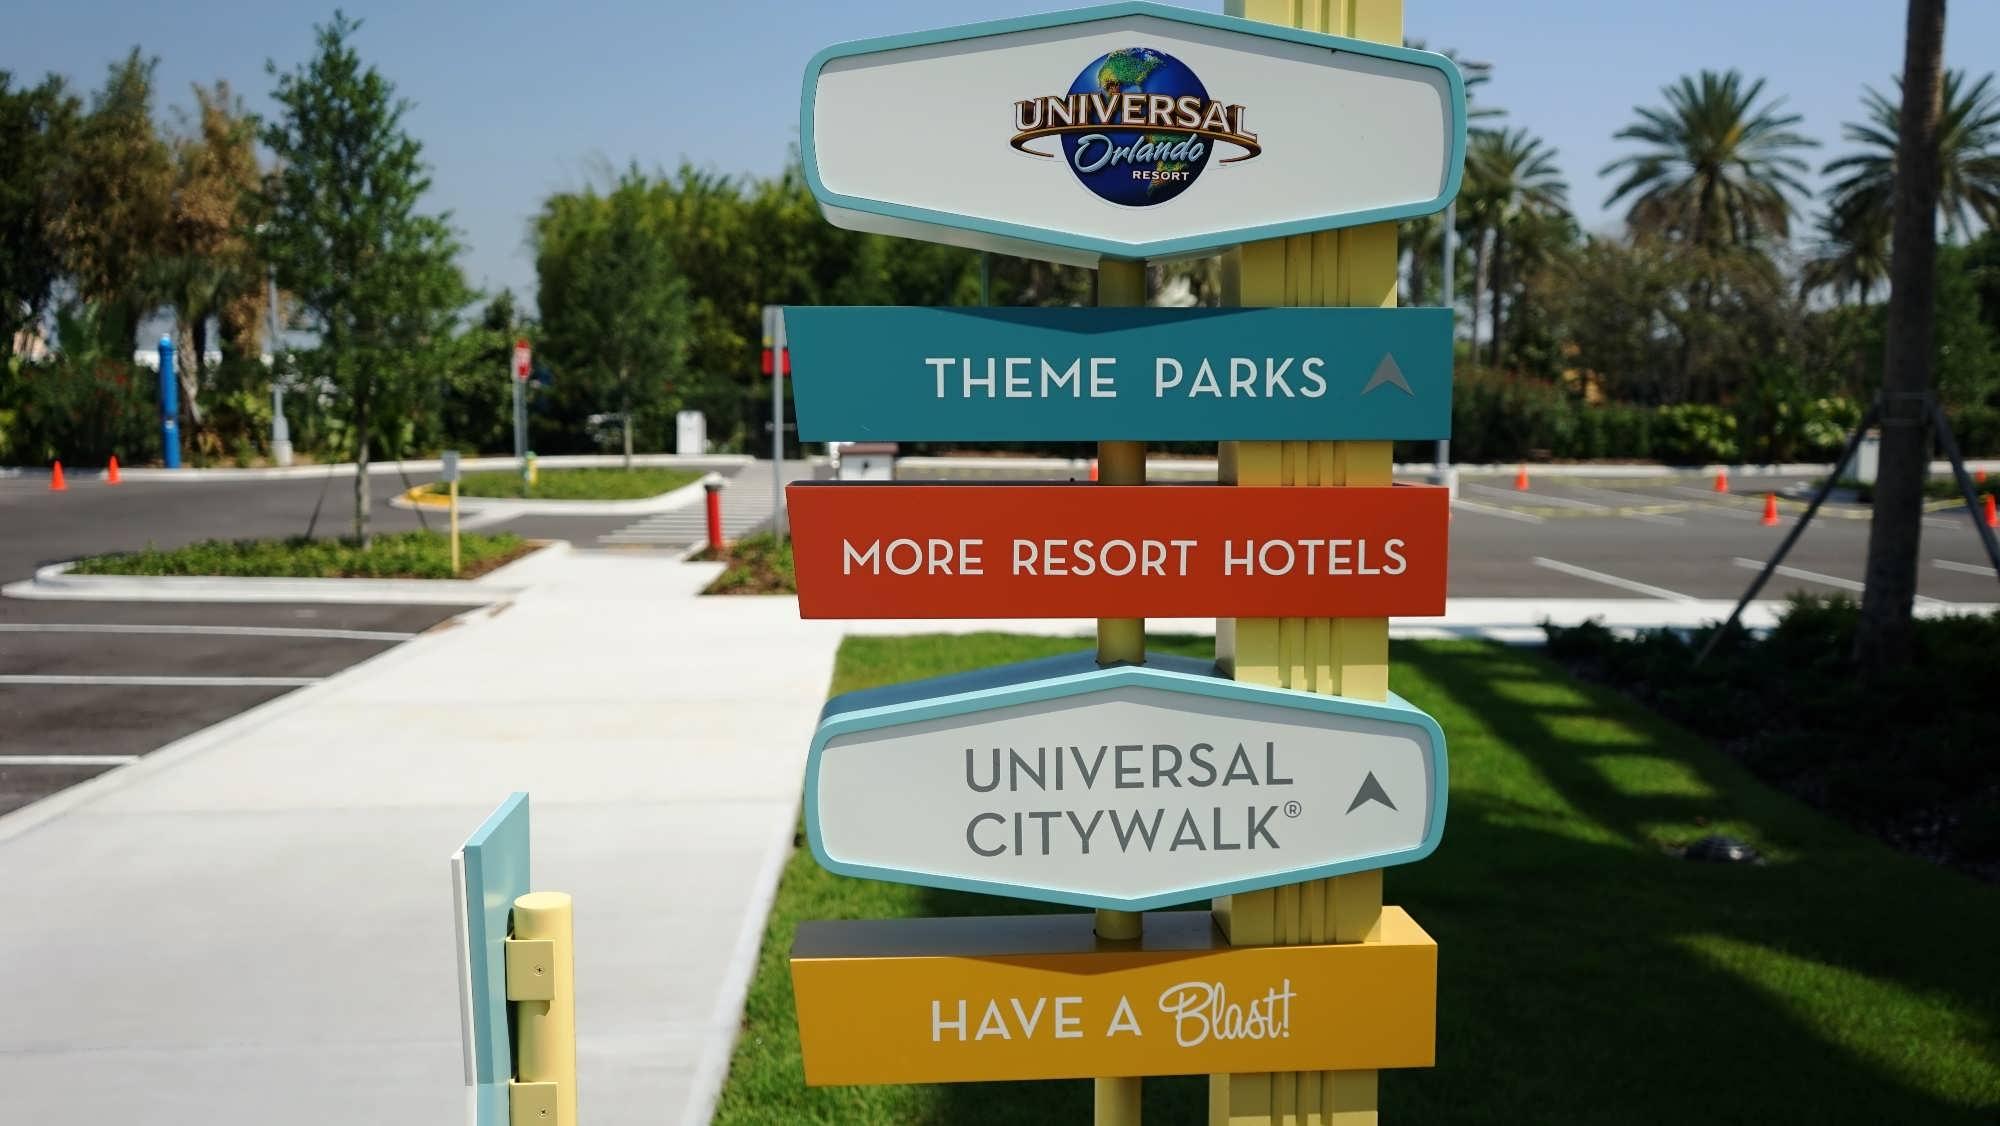 Cabana Bay Beach Resort's private path to Universal's Volcano Bay